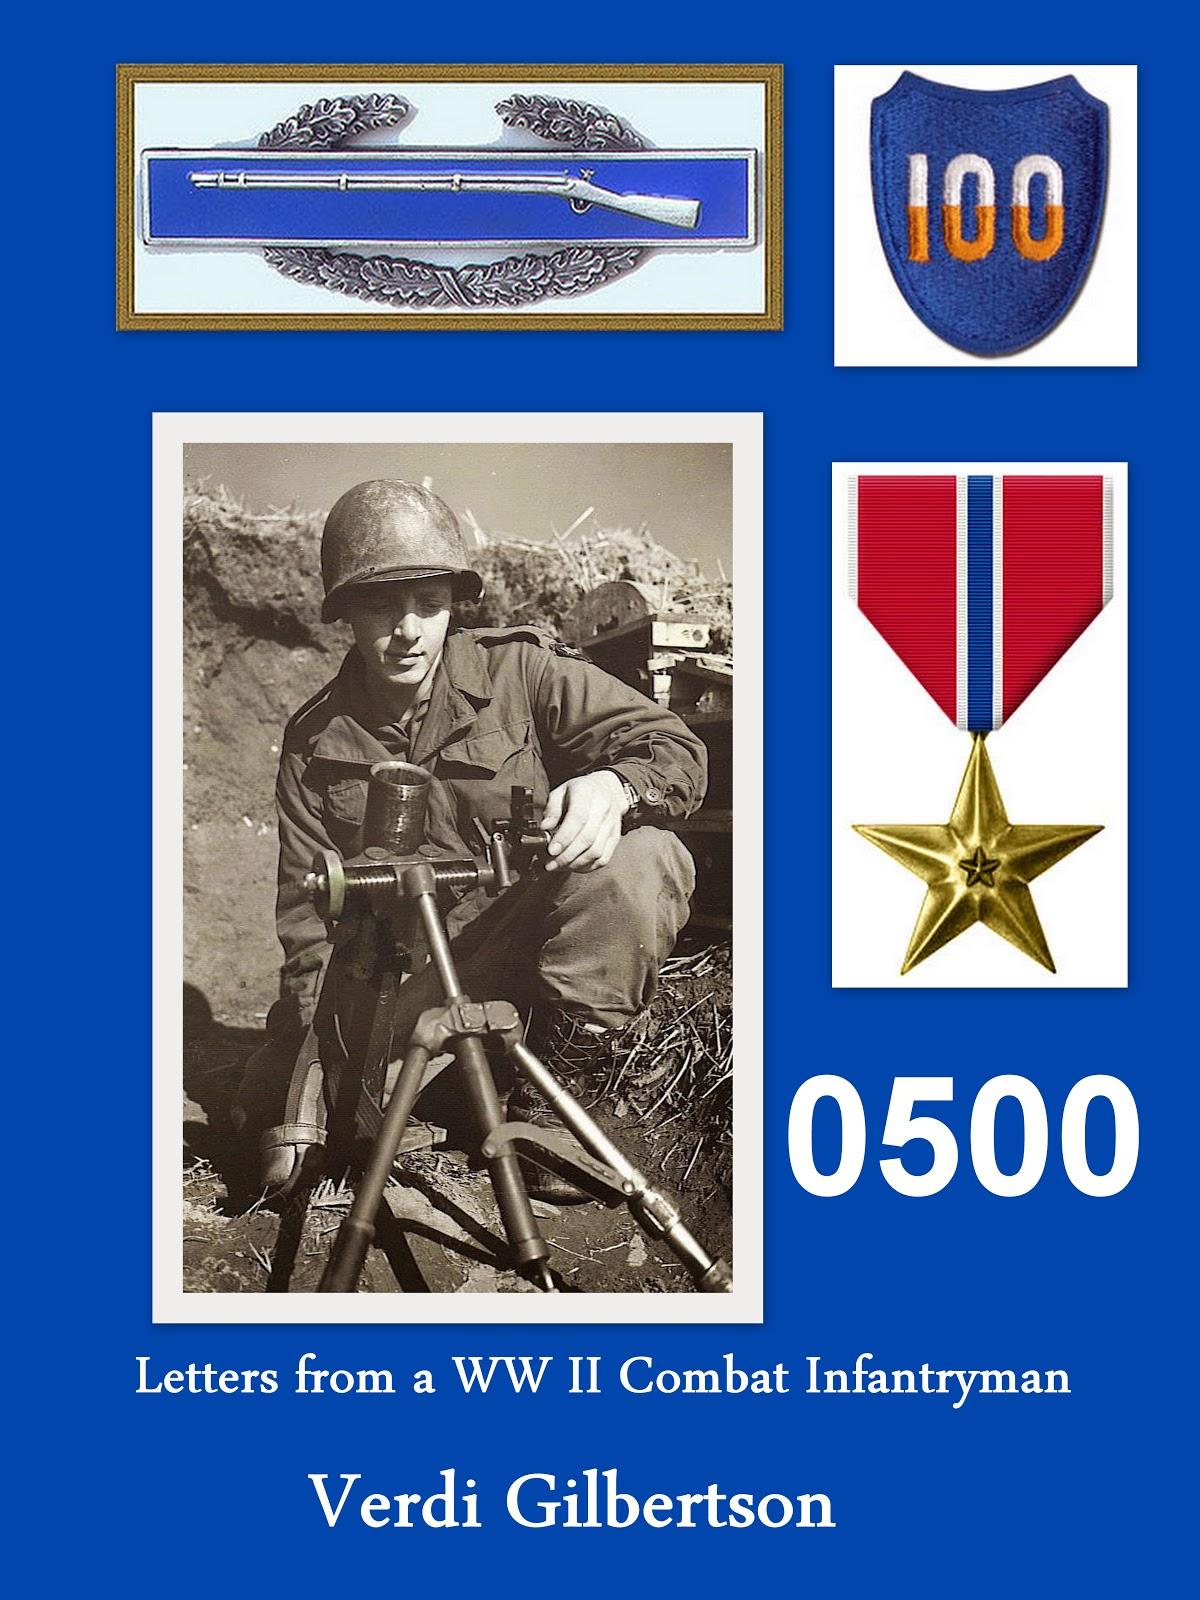 0500 Letters from a WW II Combat Infantryman by Verdi Gilbertson